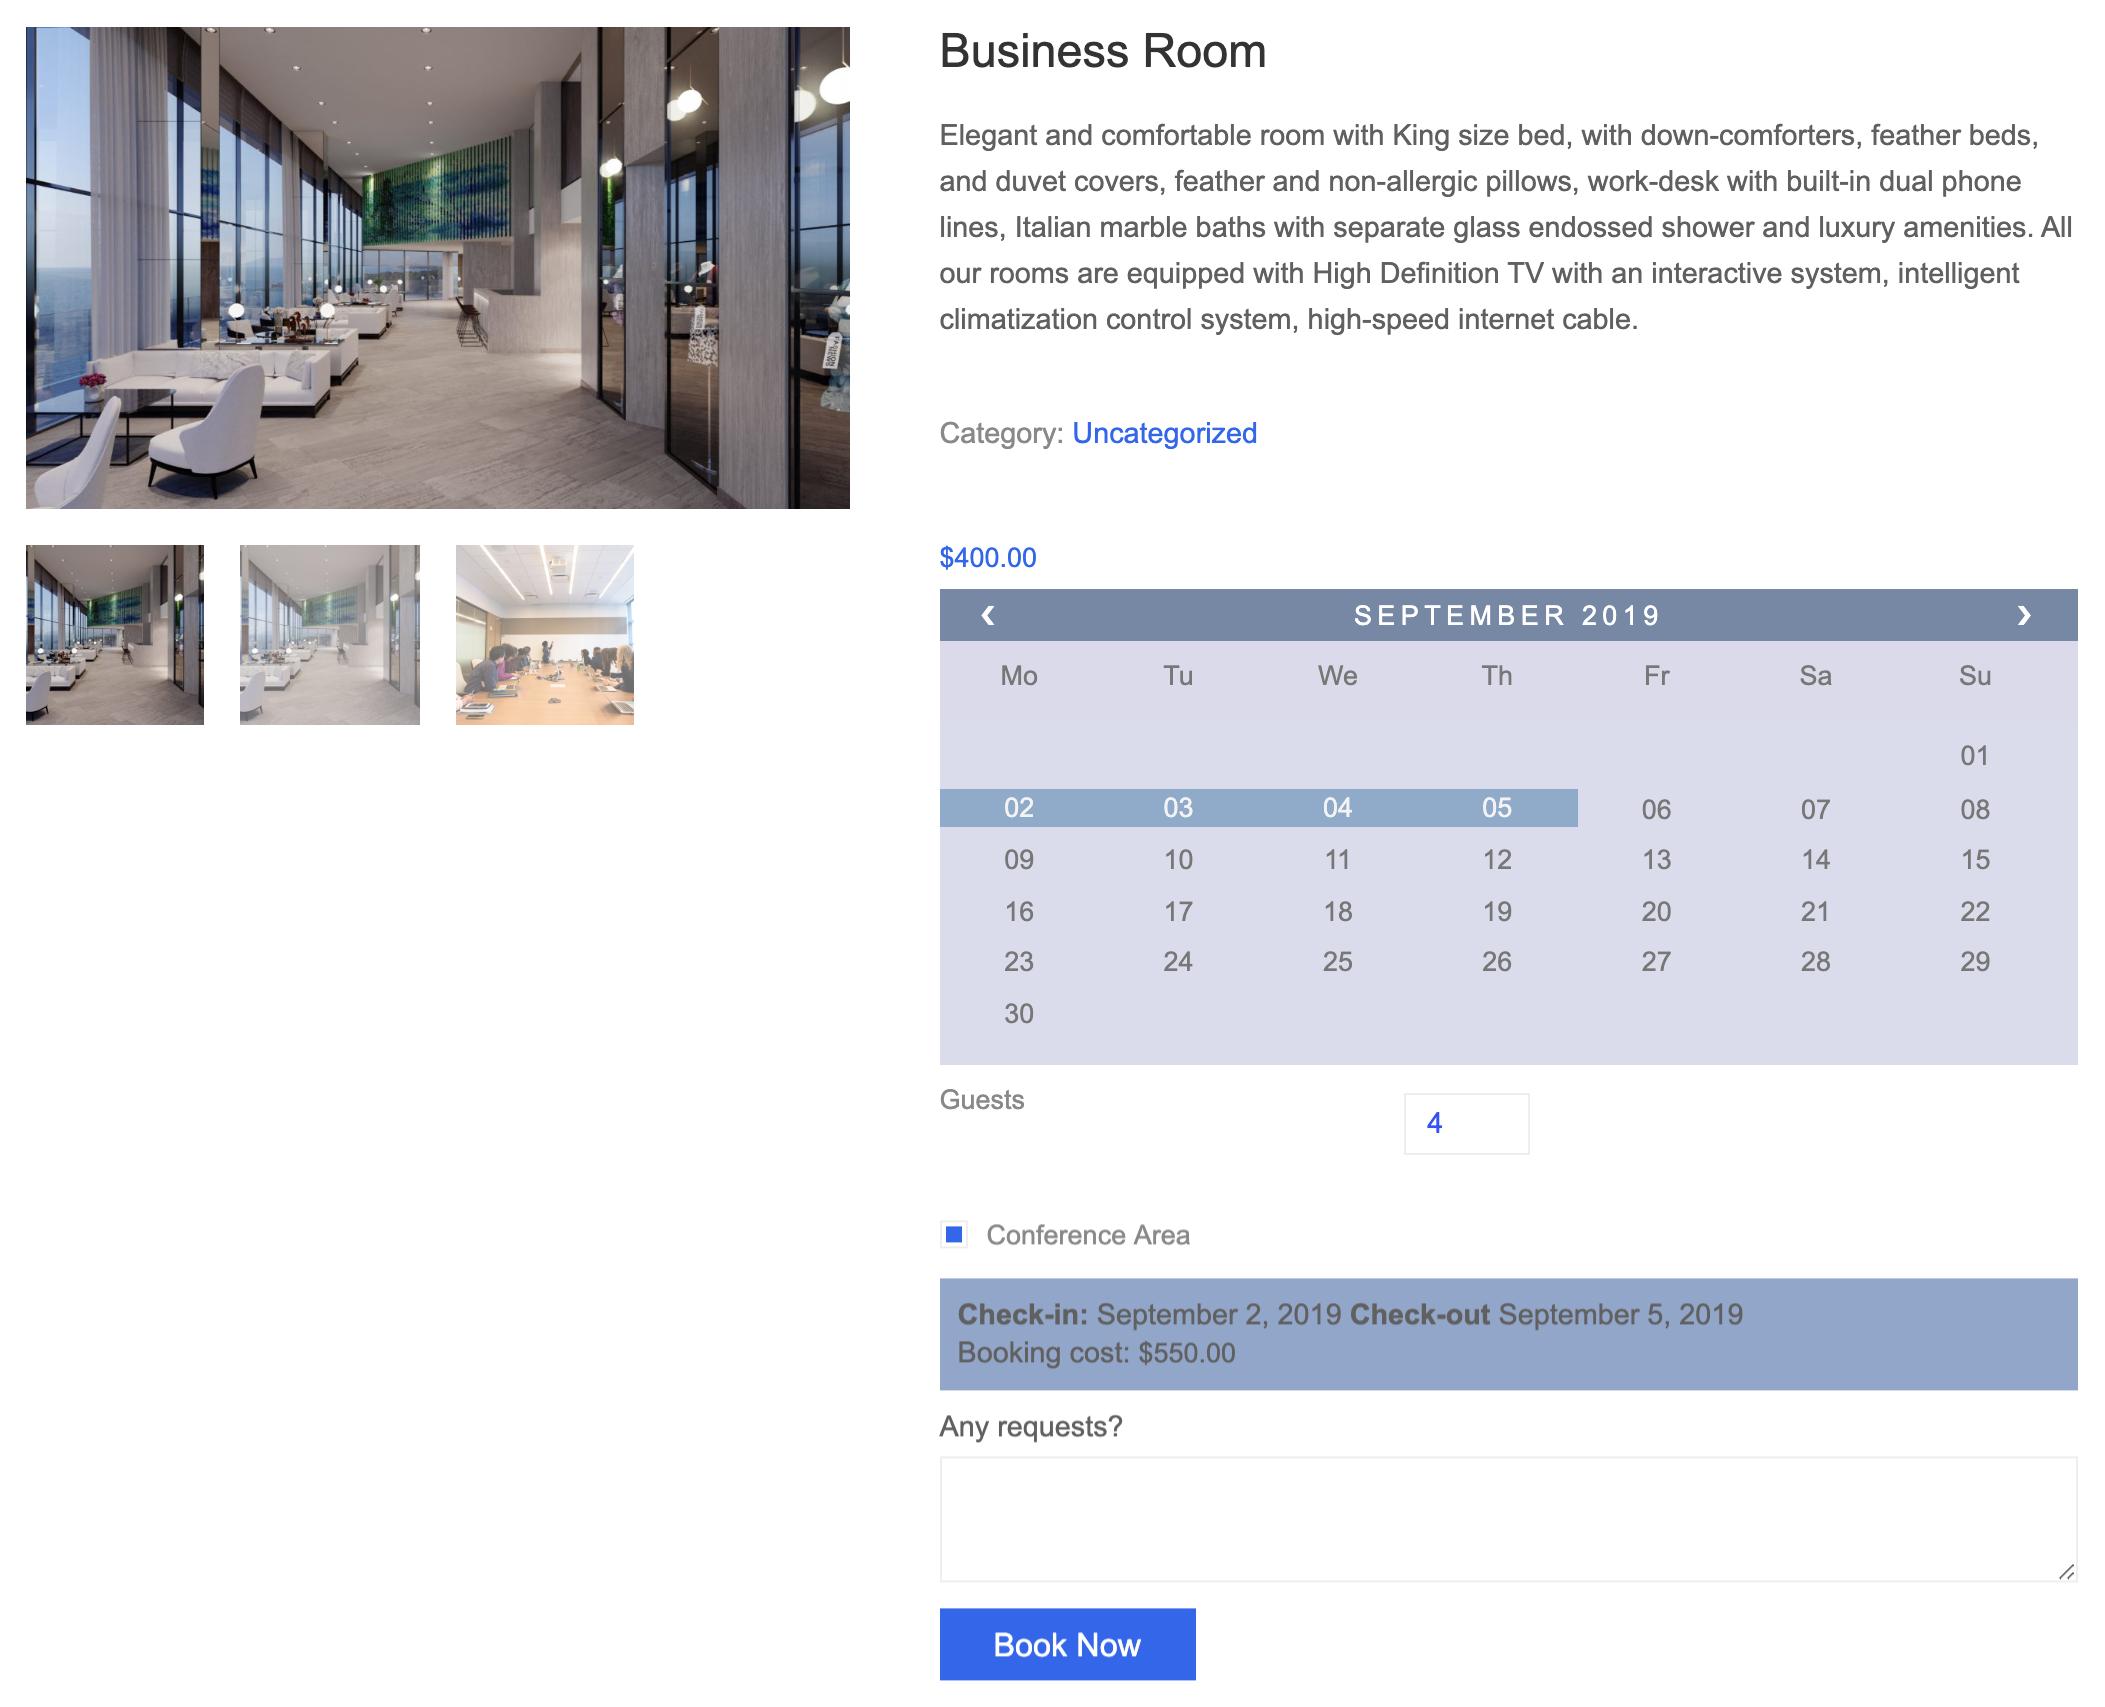 business room availability